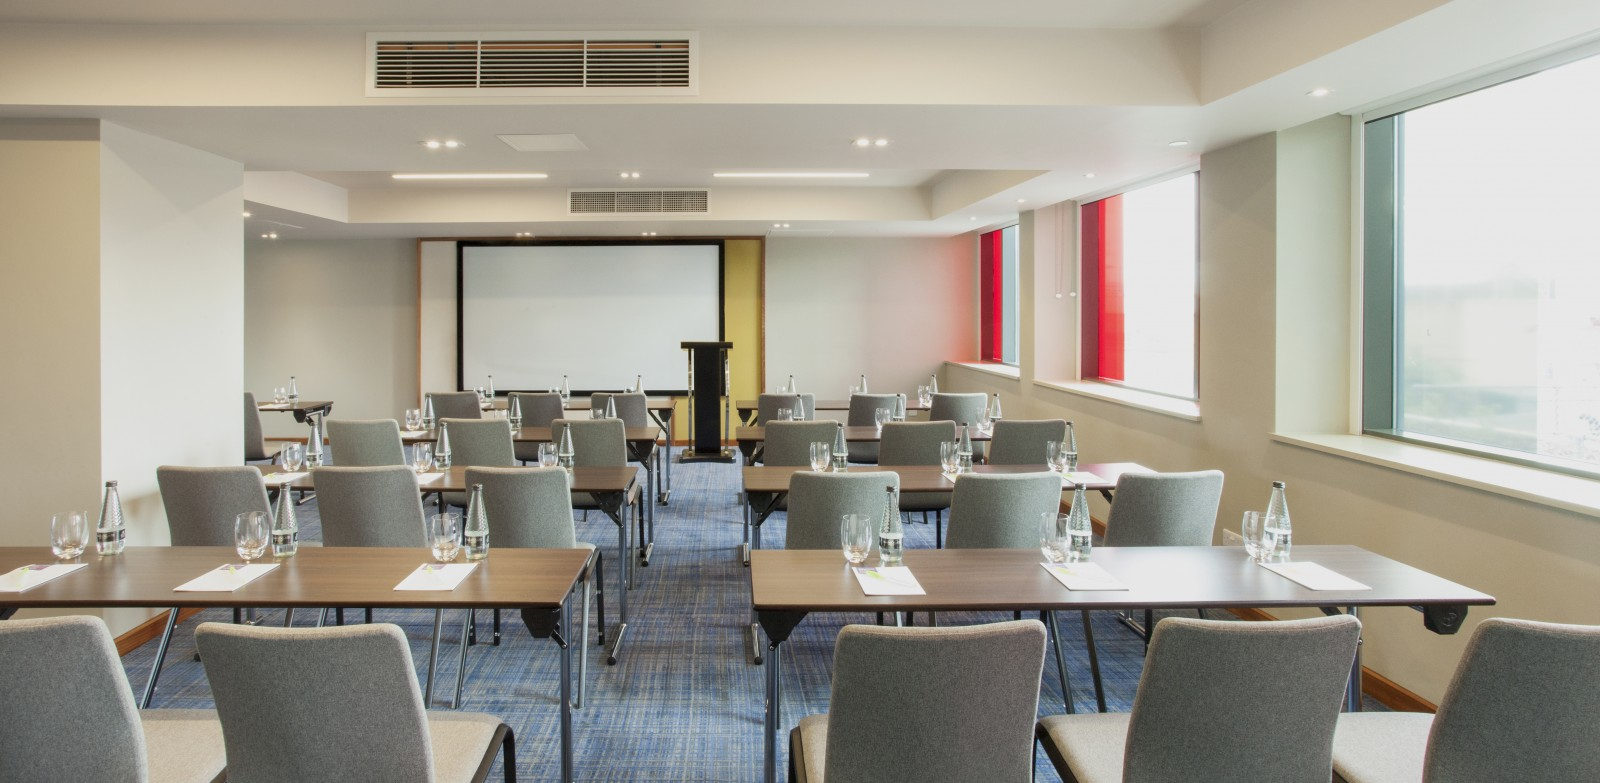 8-HyattPlacePresentation_Room_3_with_board - Juttla Architects